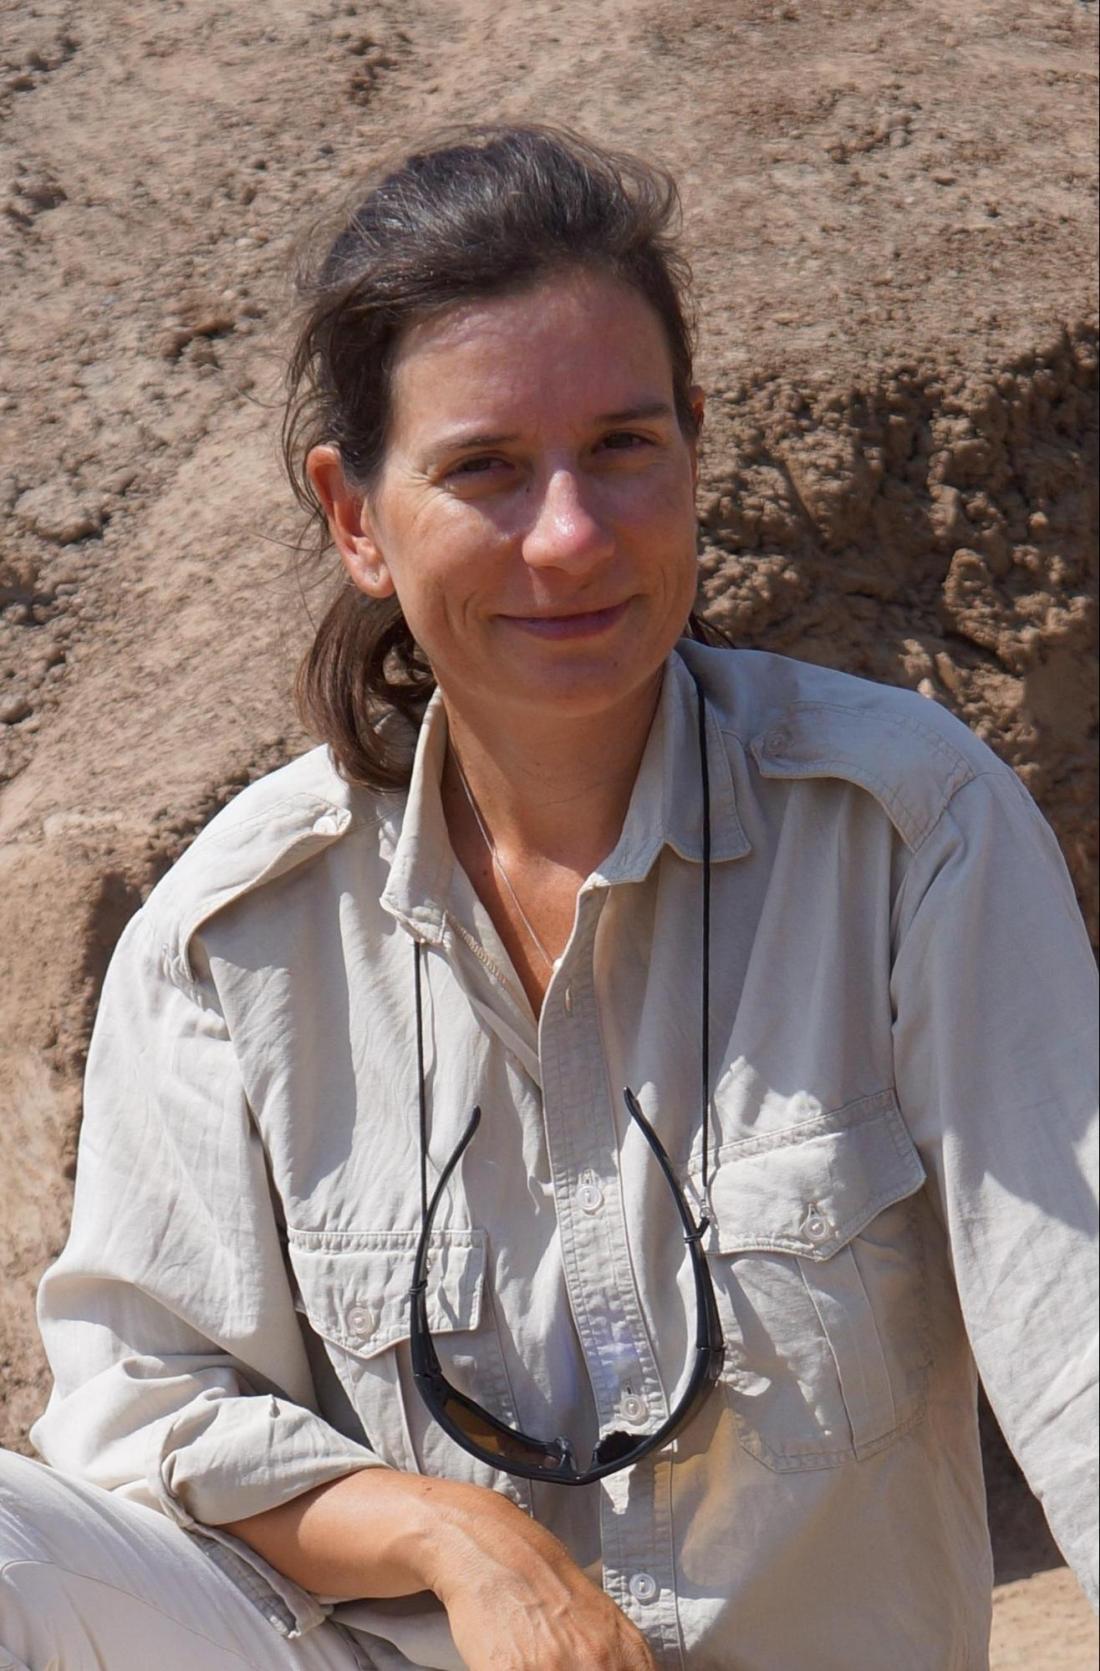 Sonia F. Harmand